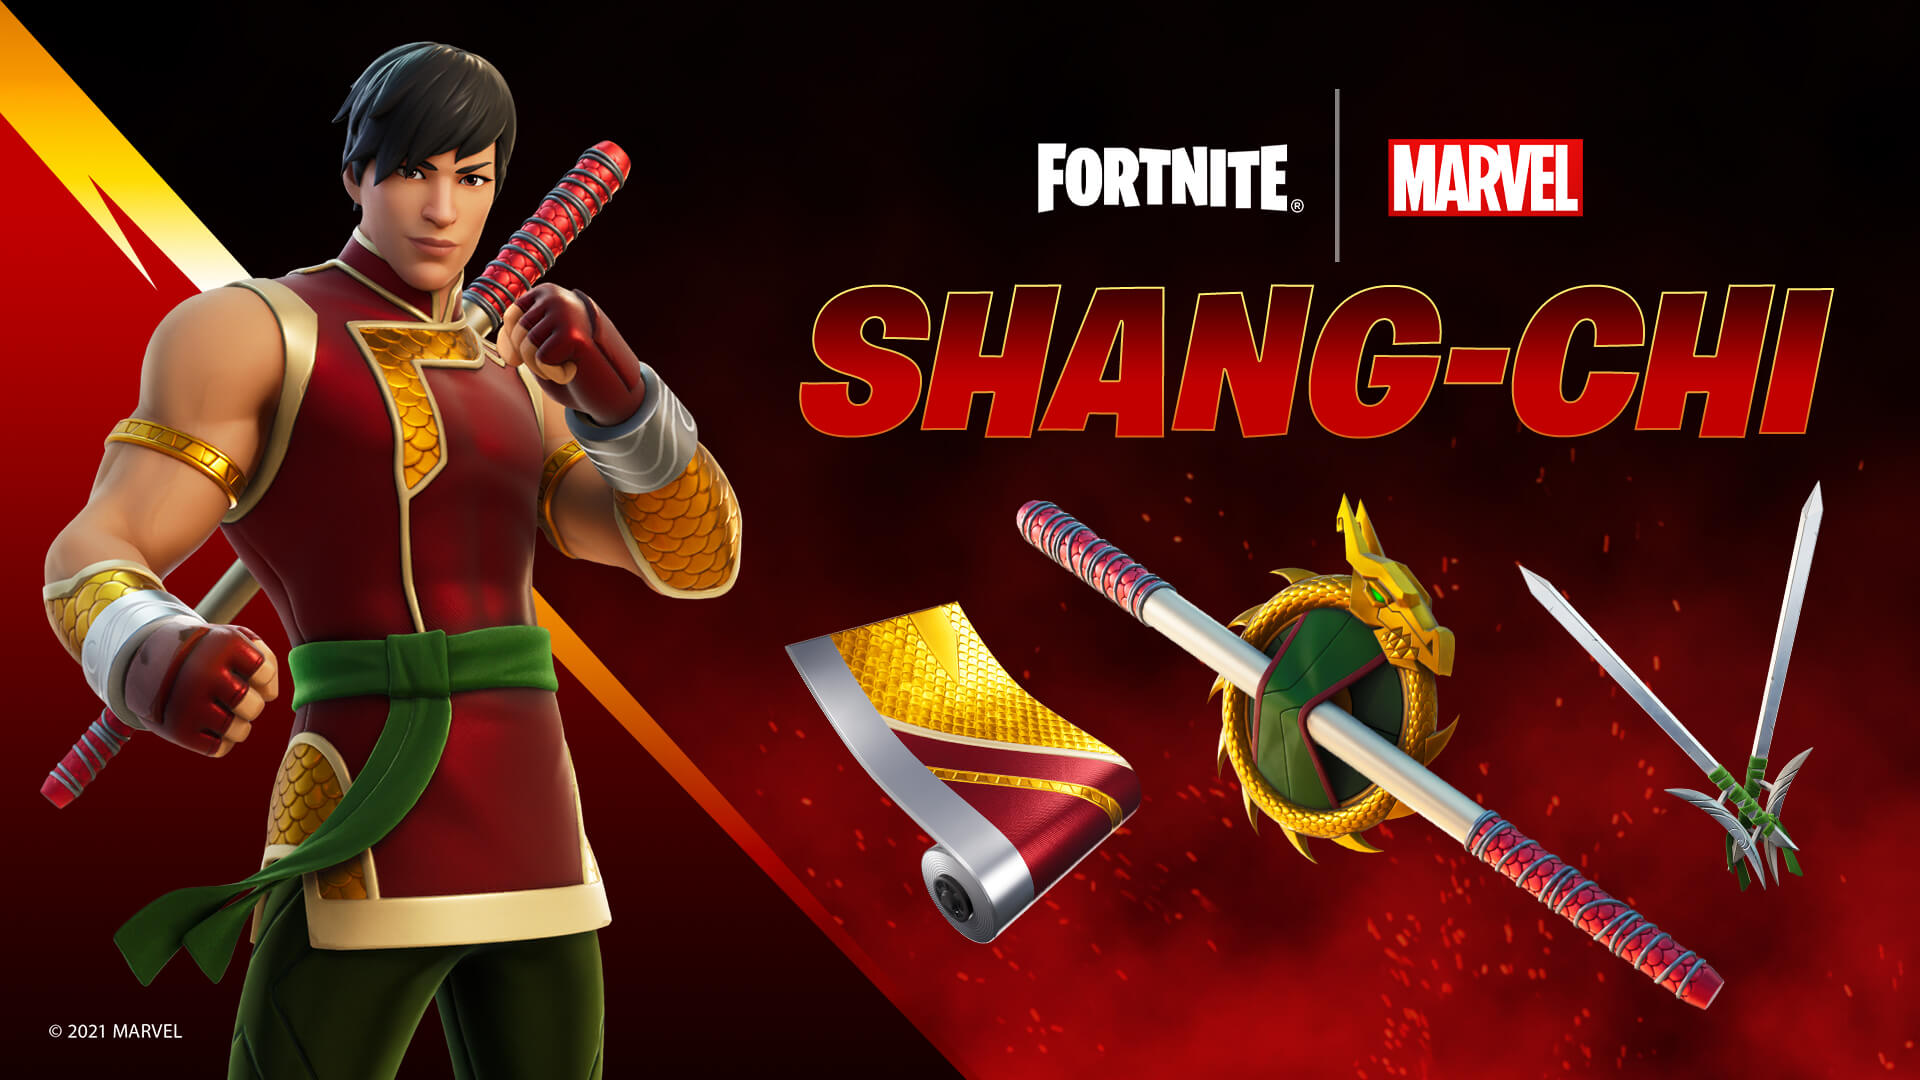 Zestaw Shang Chi w Fortnite